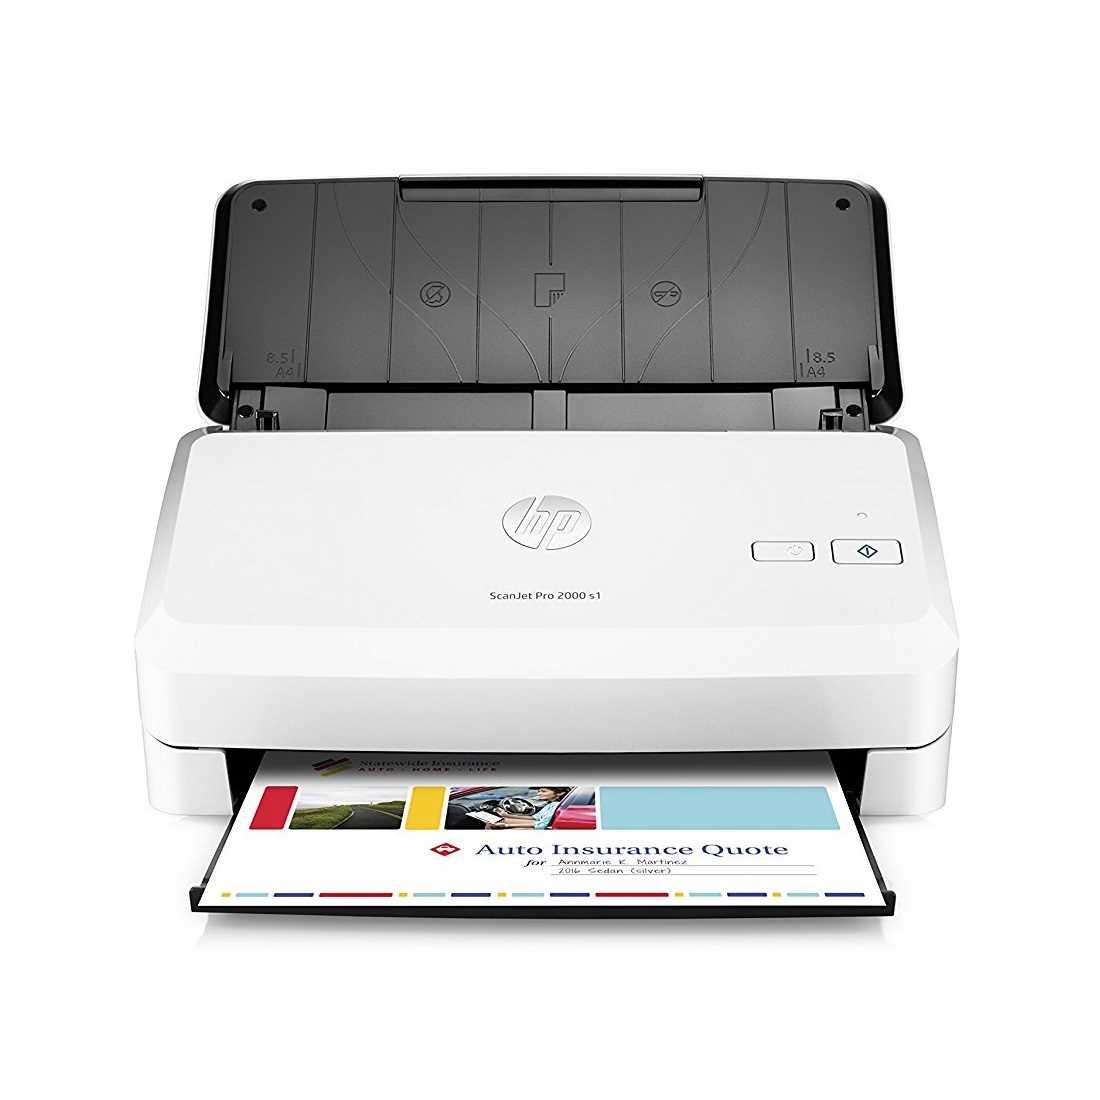 HP Scanjet Pro 2000 S1 Scanner